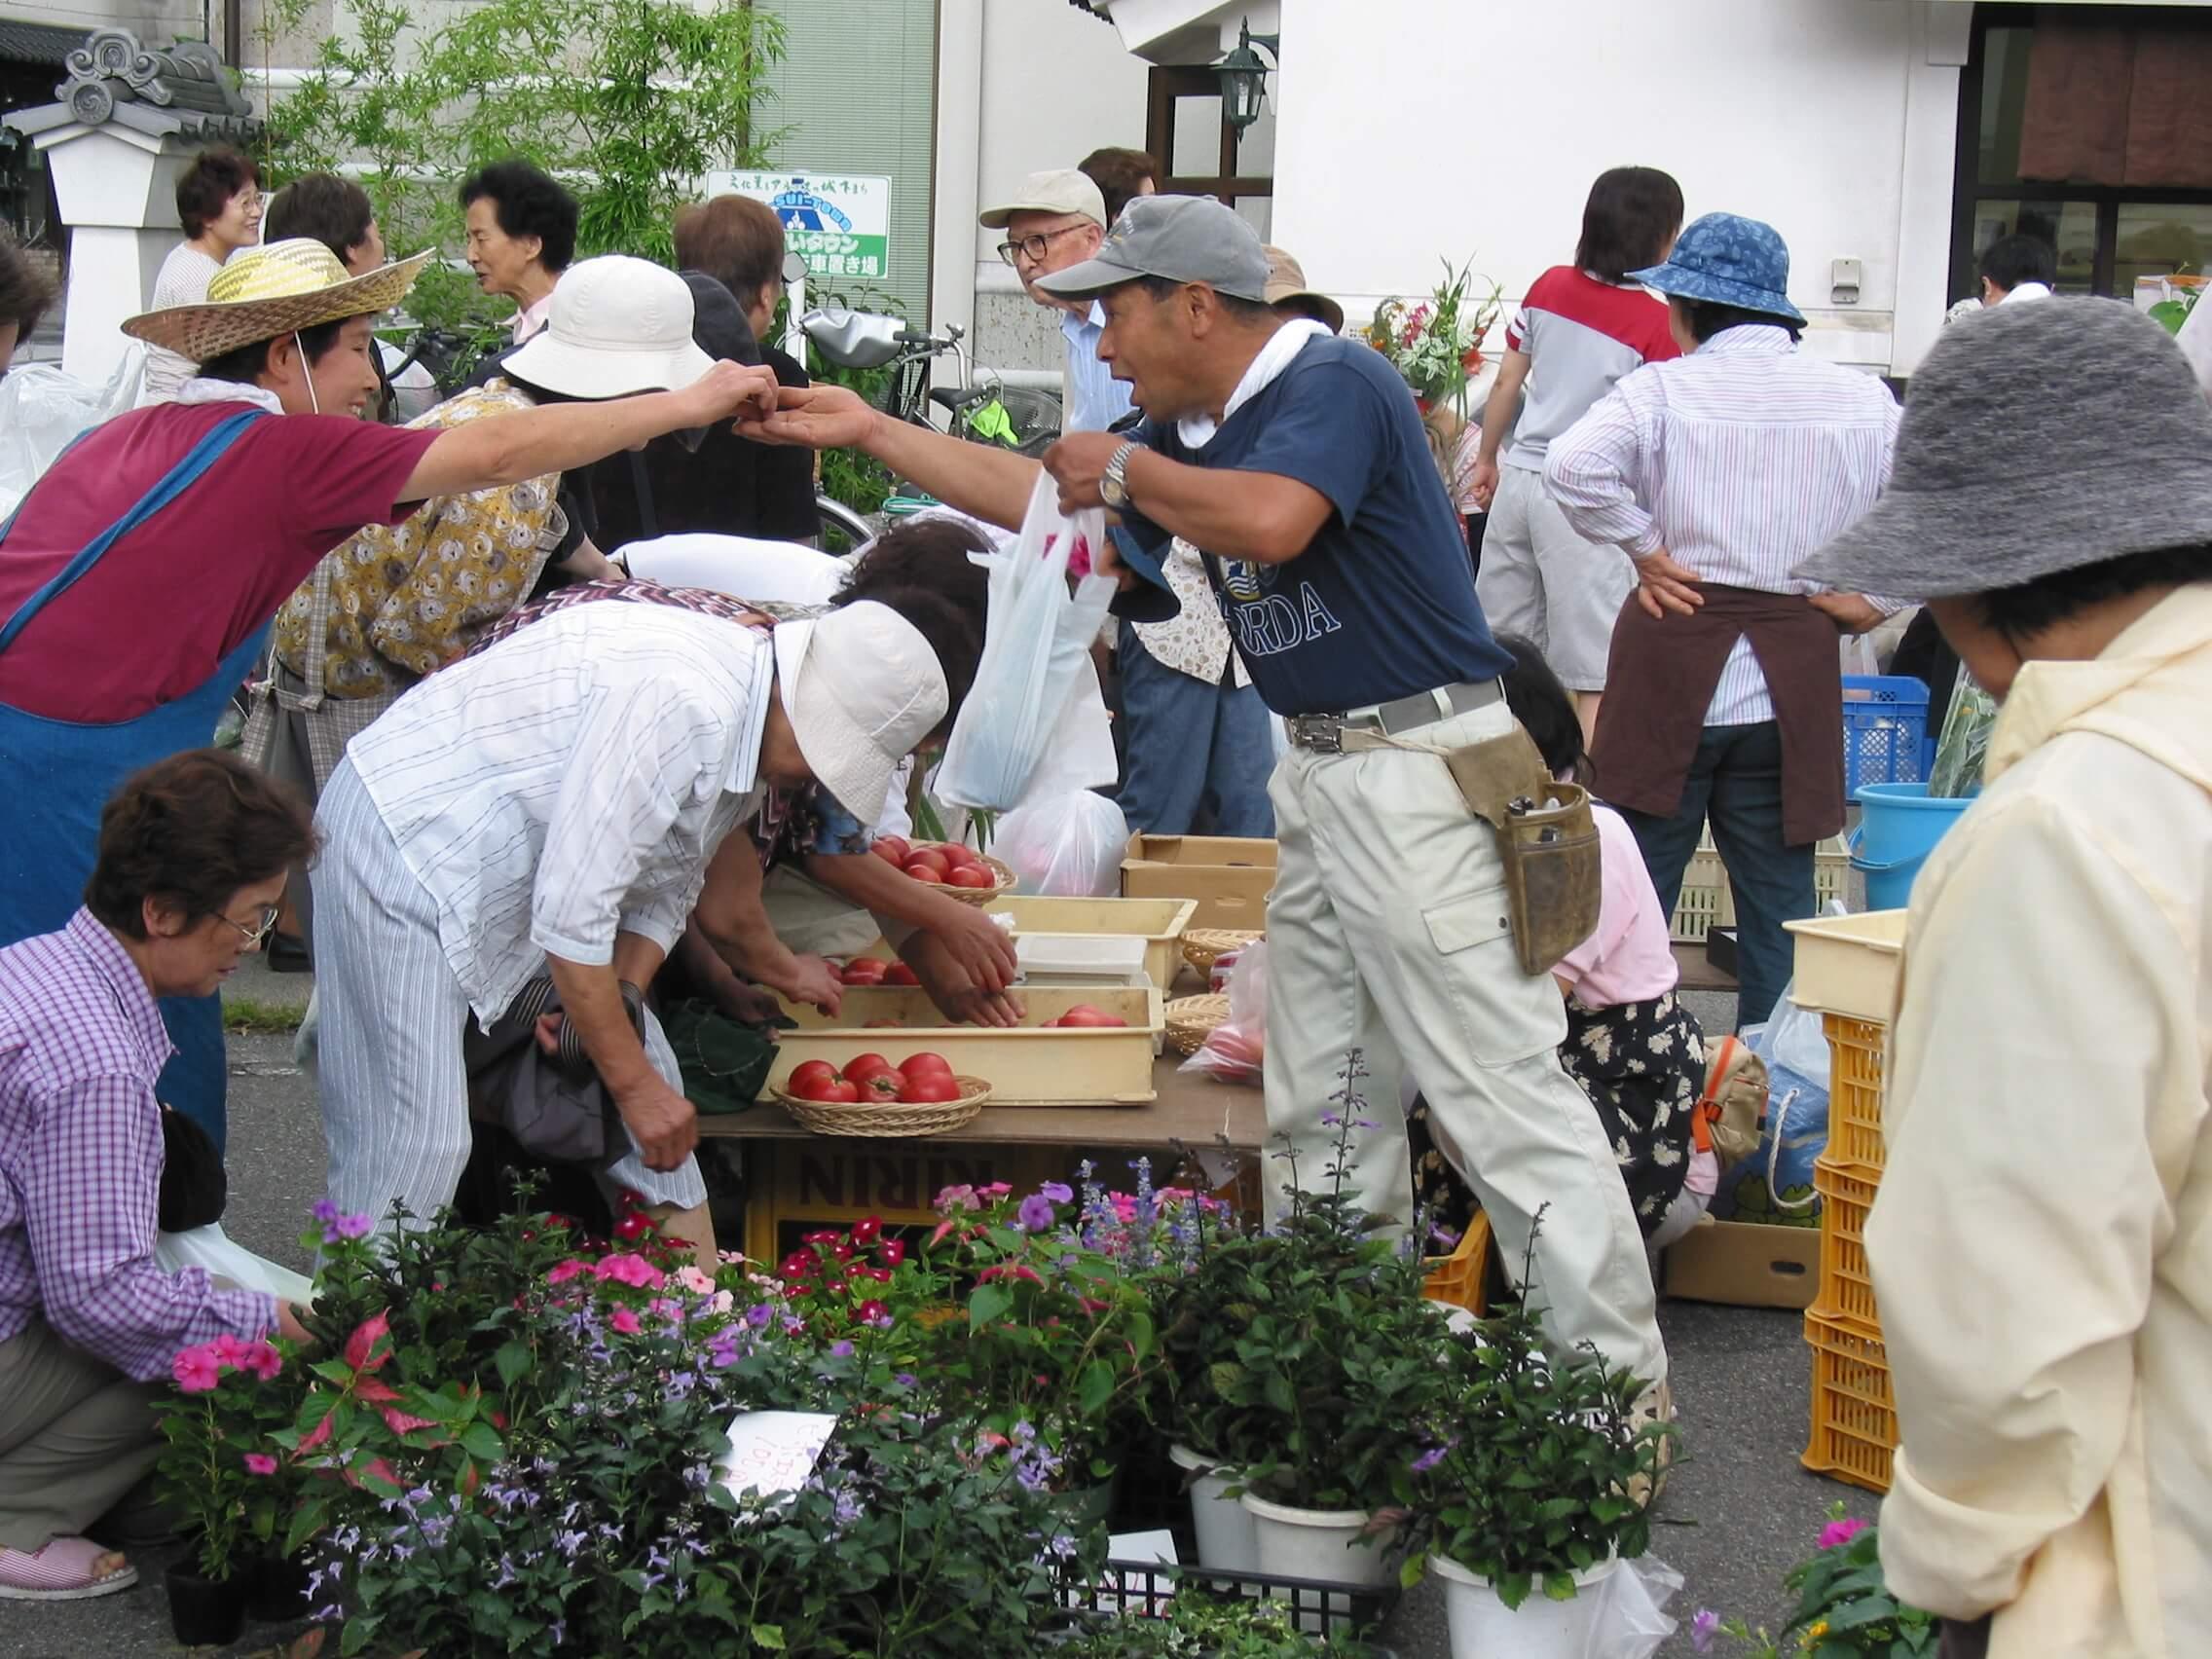 Nakamachi District Matsumoto